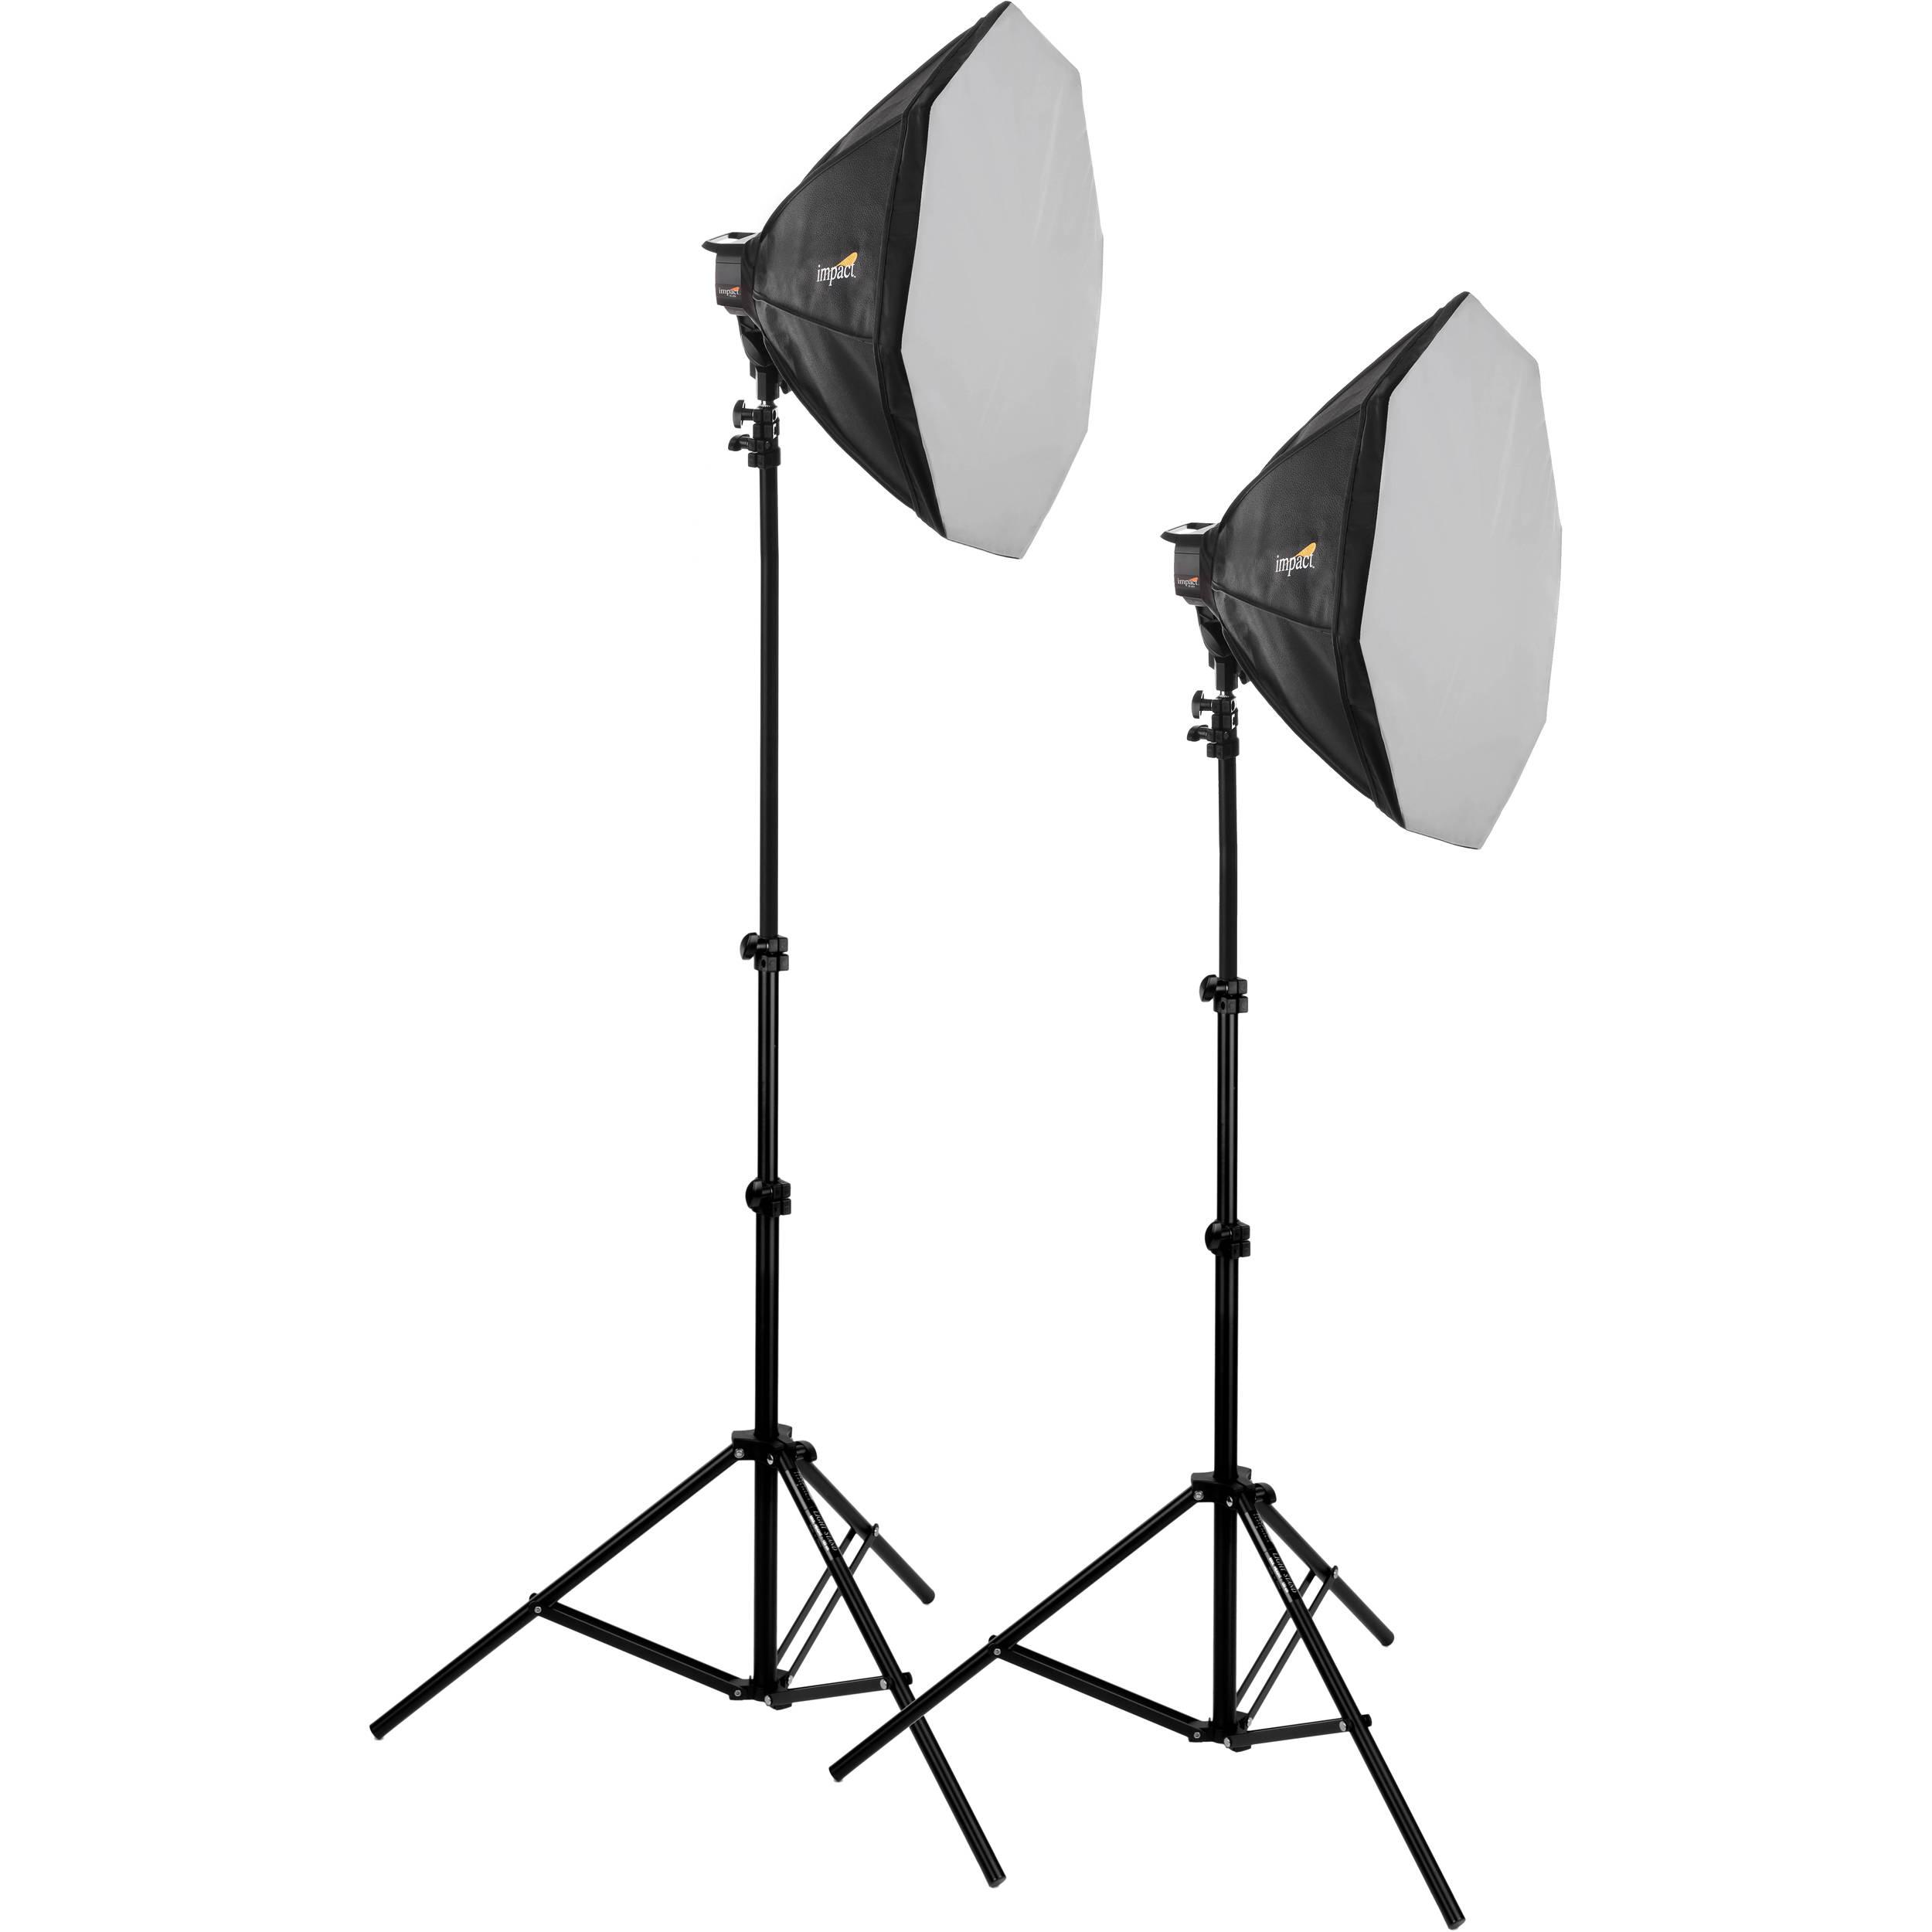 Https C Product 1061827 Reg Paper Kit Kodak 605 Impact Octa Soft And Natural 1068328